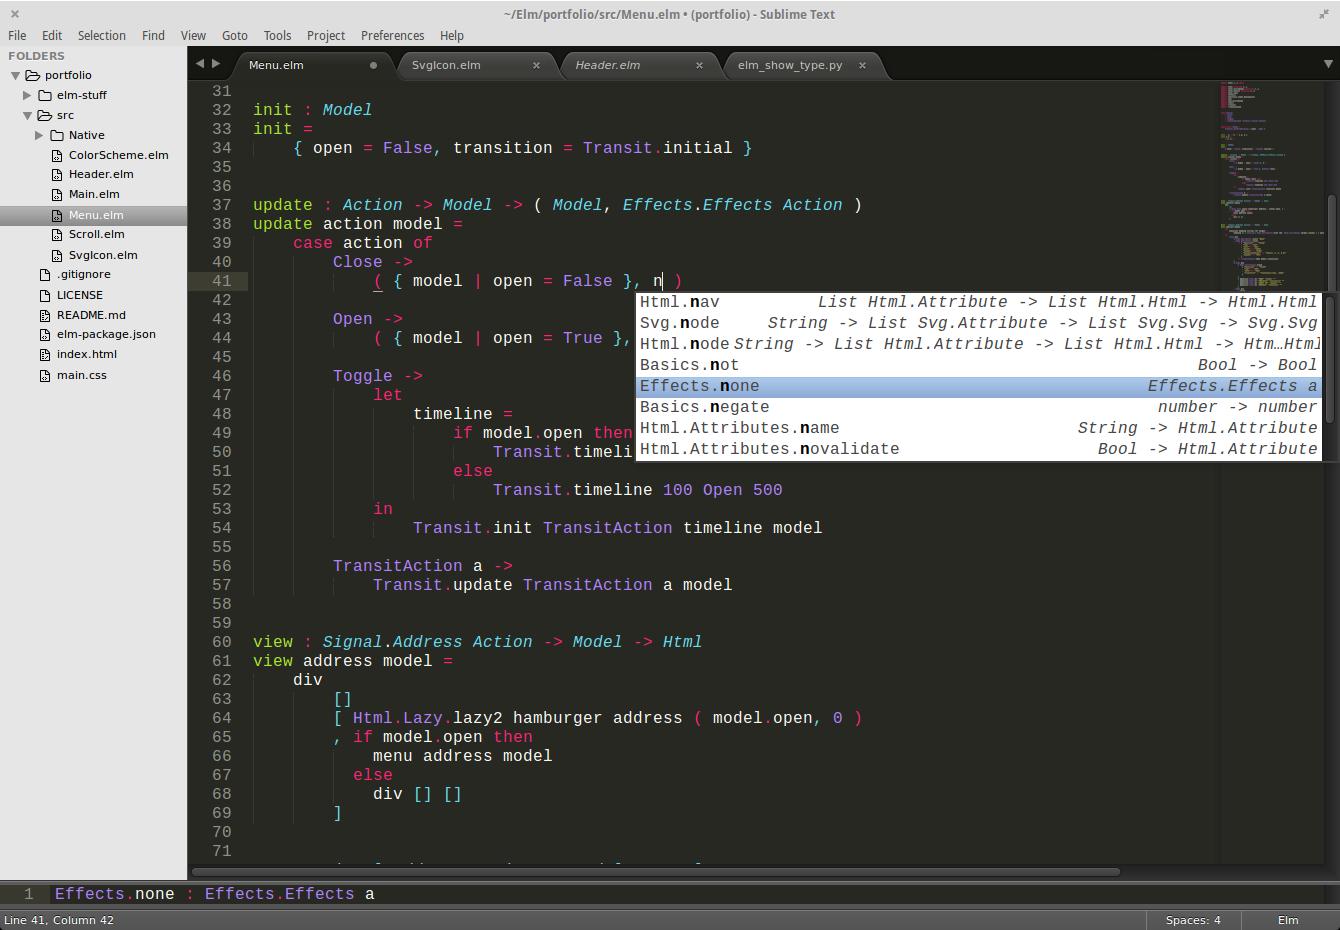 autocompletions screenshot